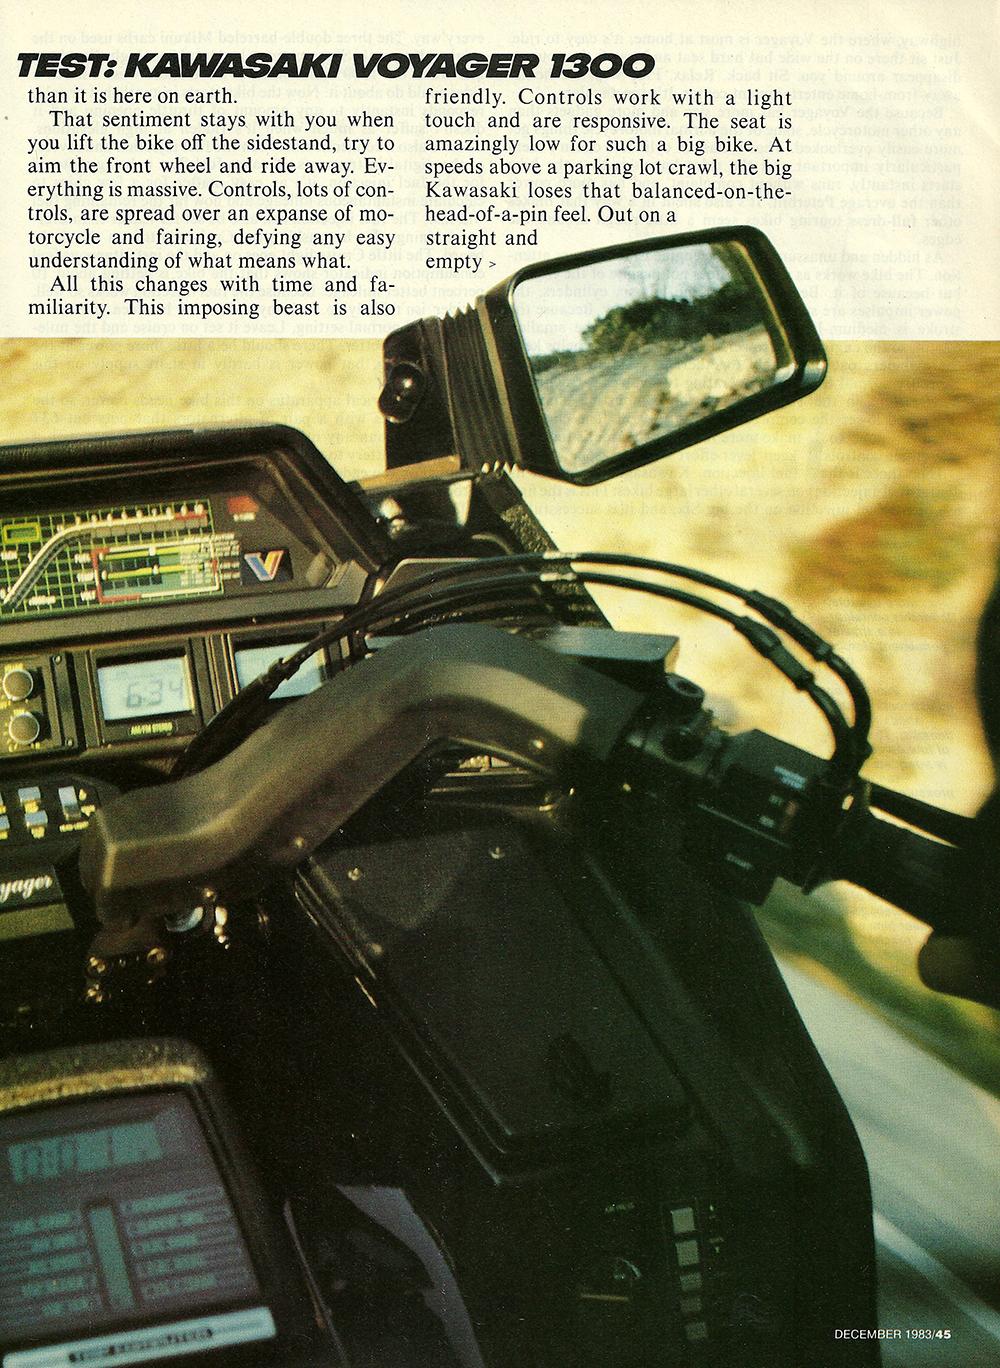 1983 Kawasaki Voyager 1300 road test 02.jpg